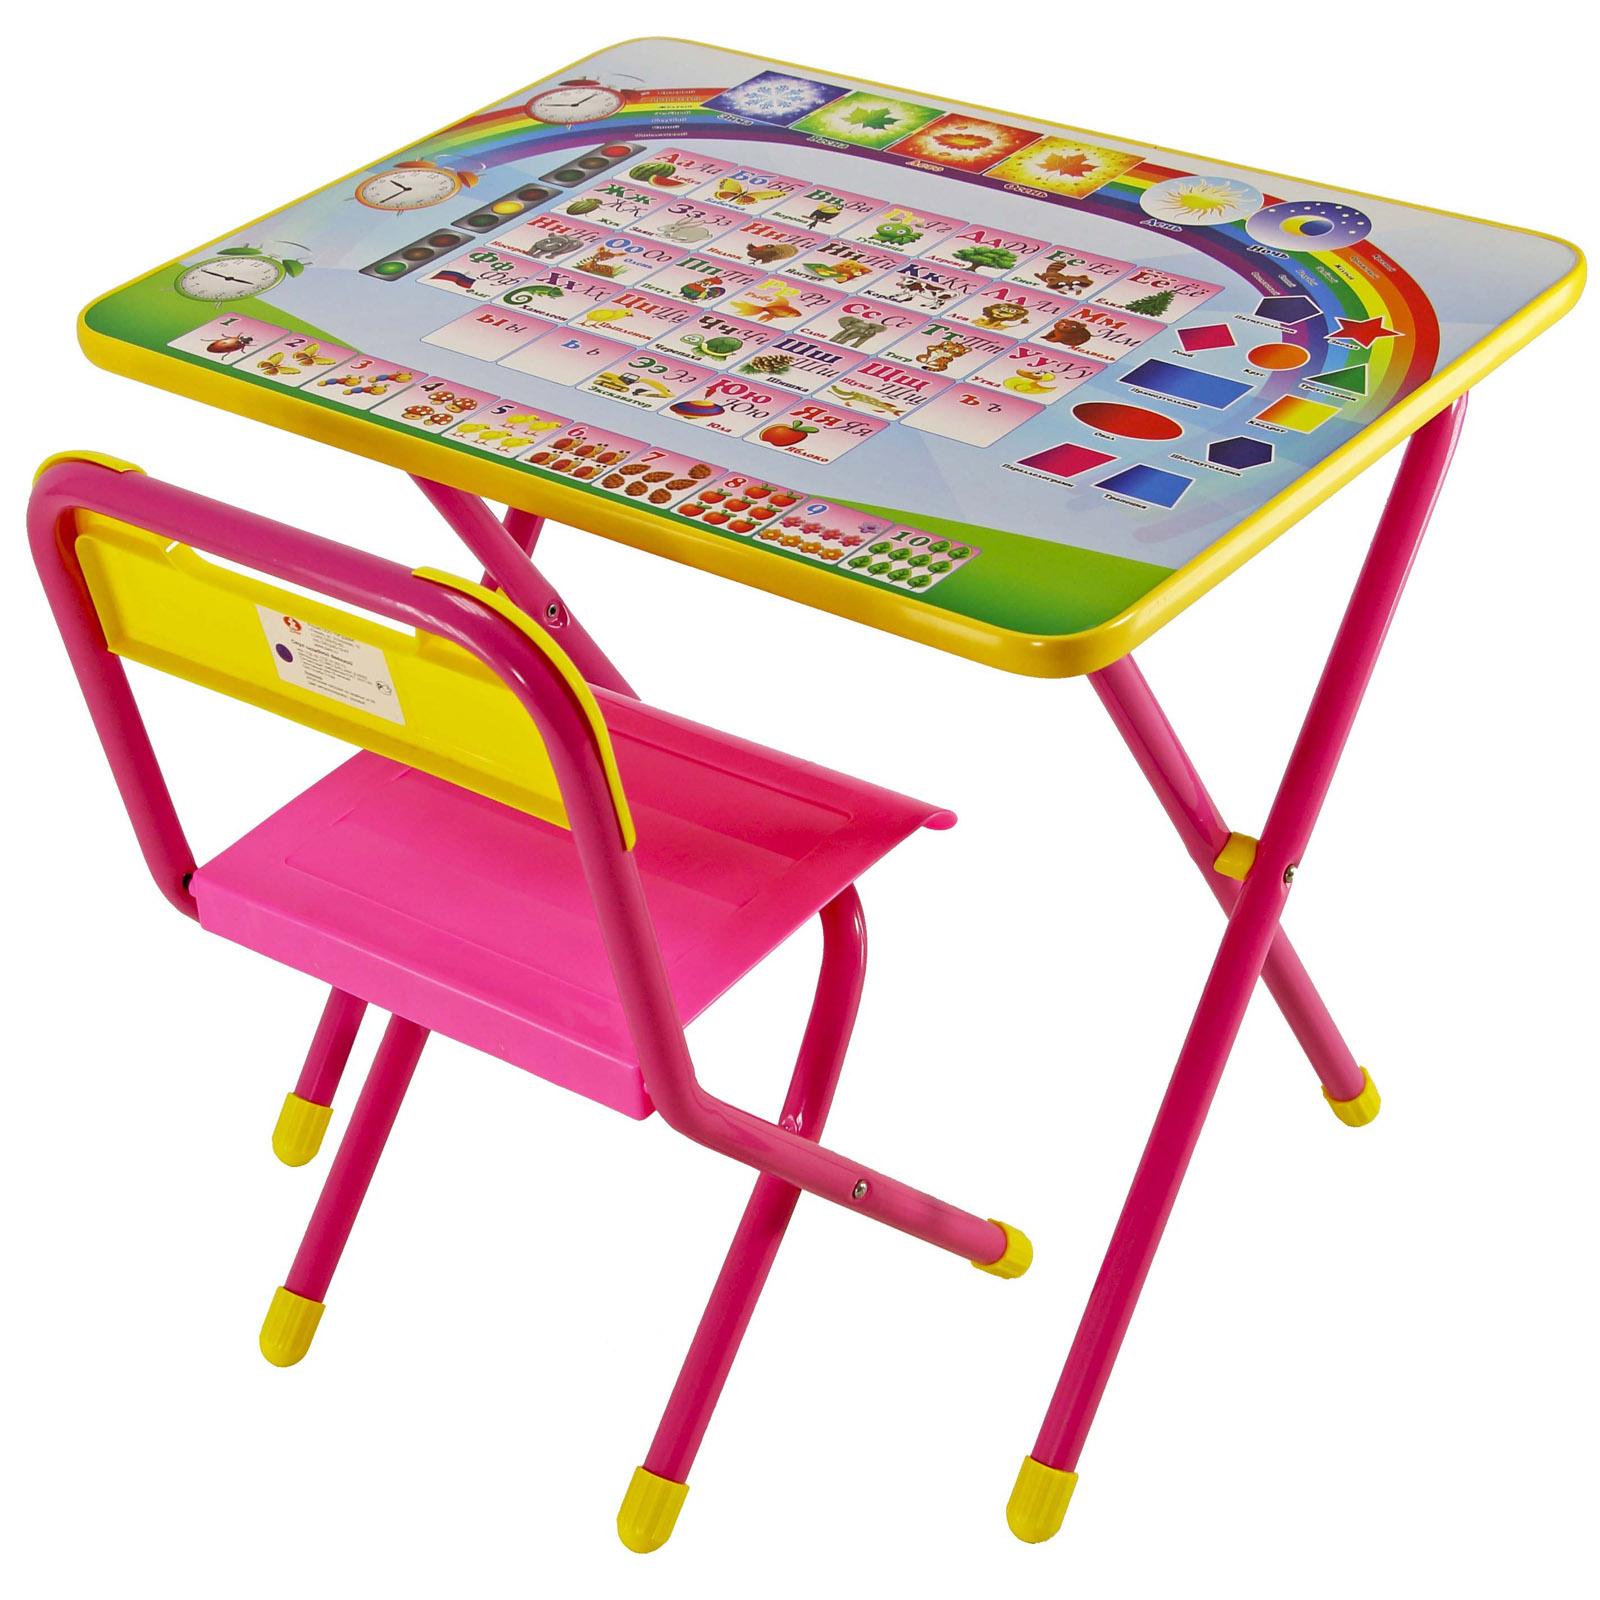 Набор мебели стол и стул Дэми №1 Розовый Алфавит<br>